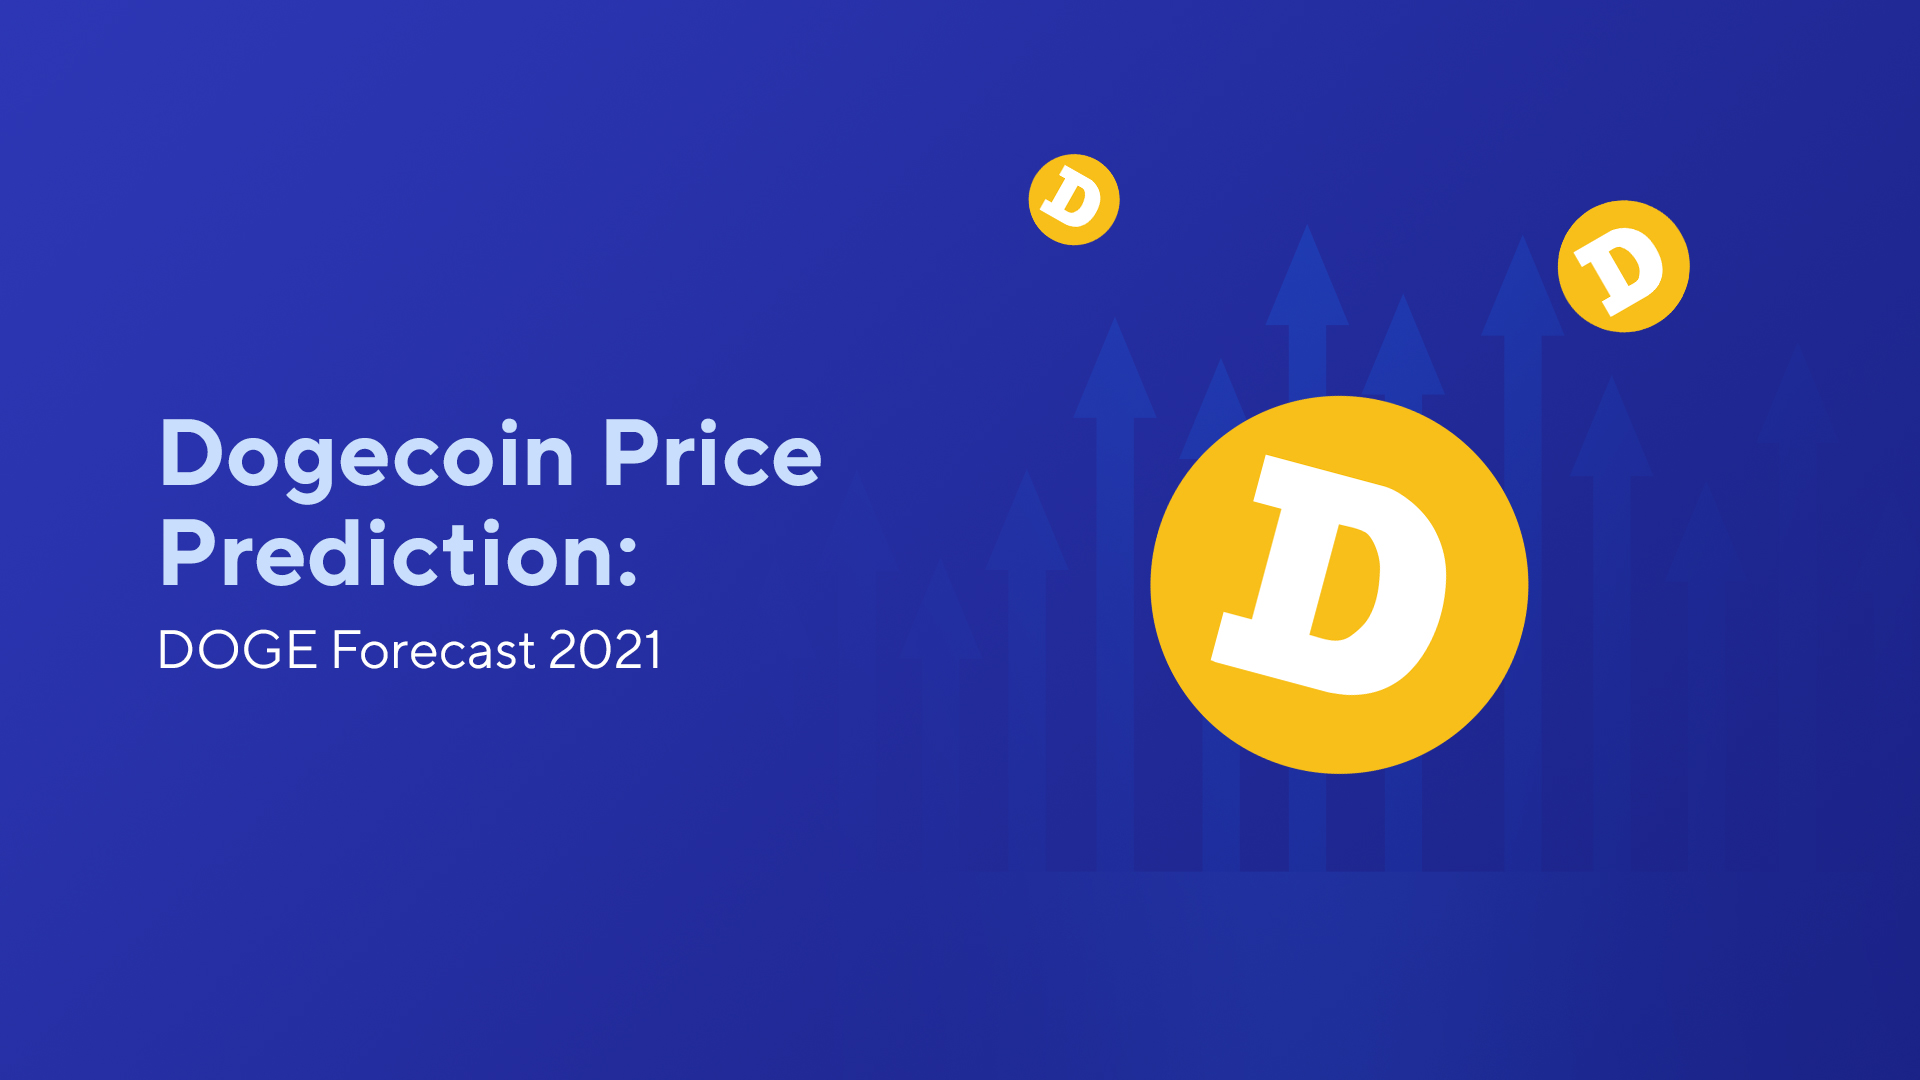 Dogecoin Price Prediction: DOGE Forecast 2021